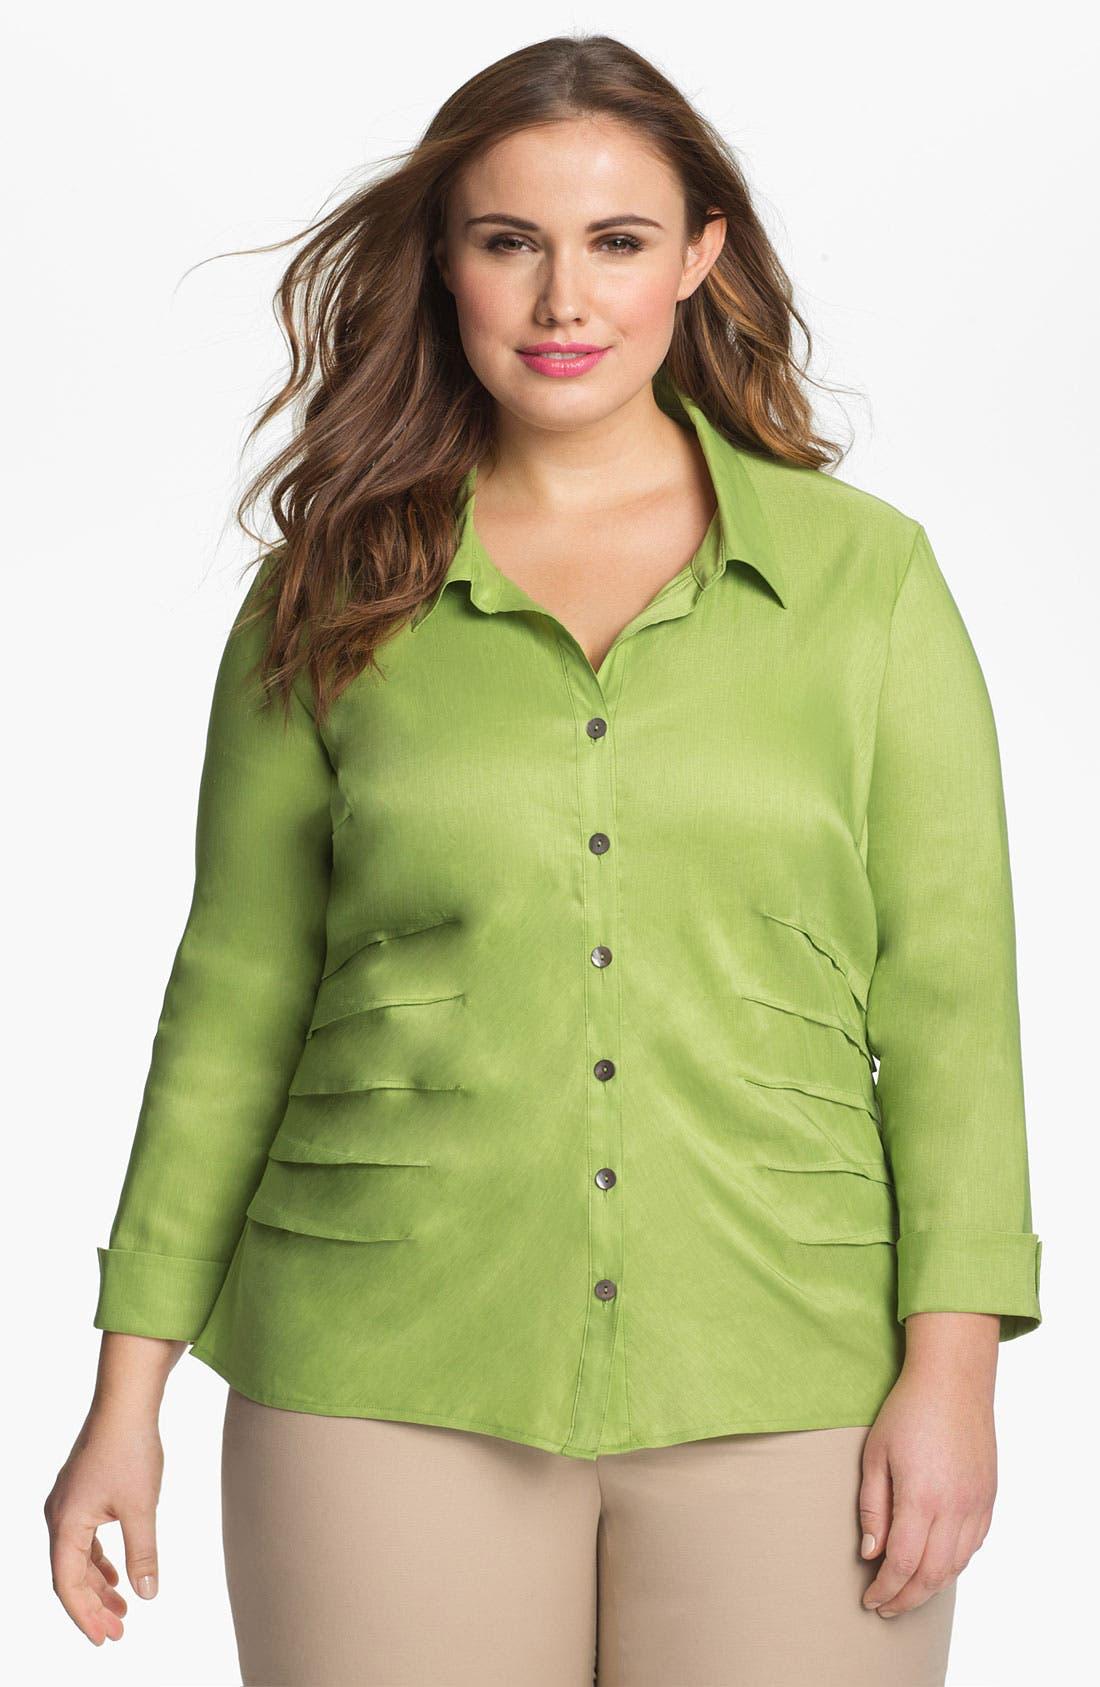 Main Image - Nic + Zoe Button Up Shirt (Plus Size)